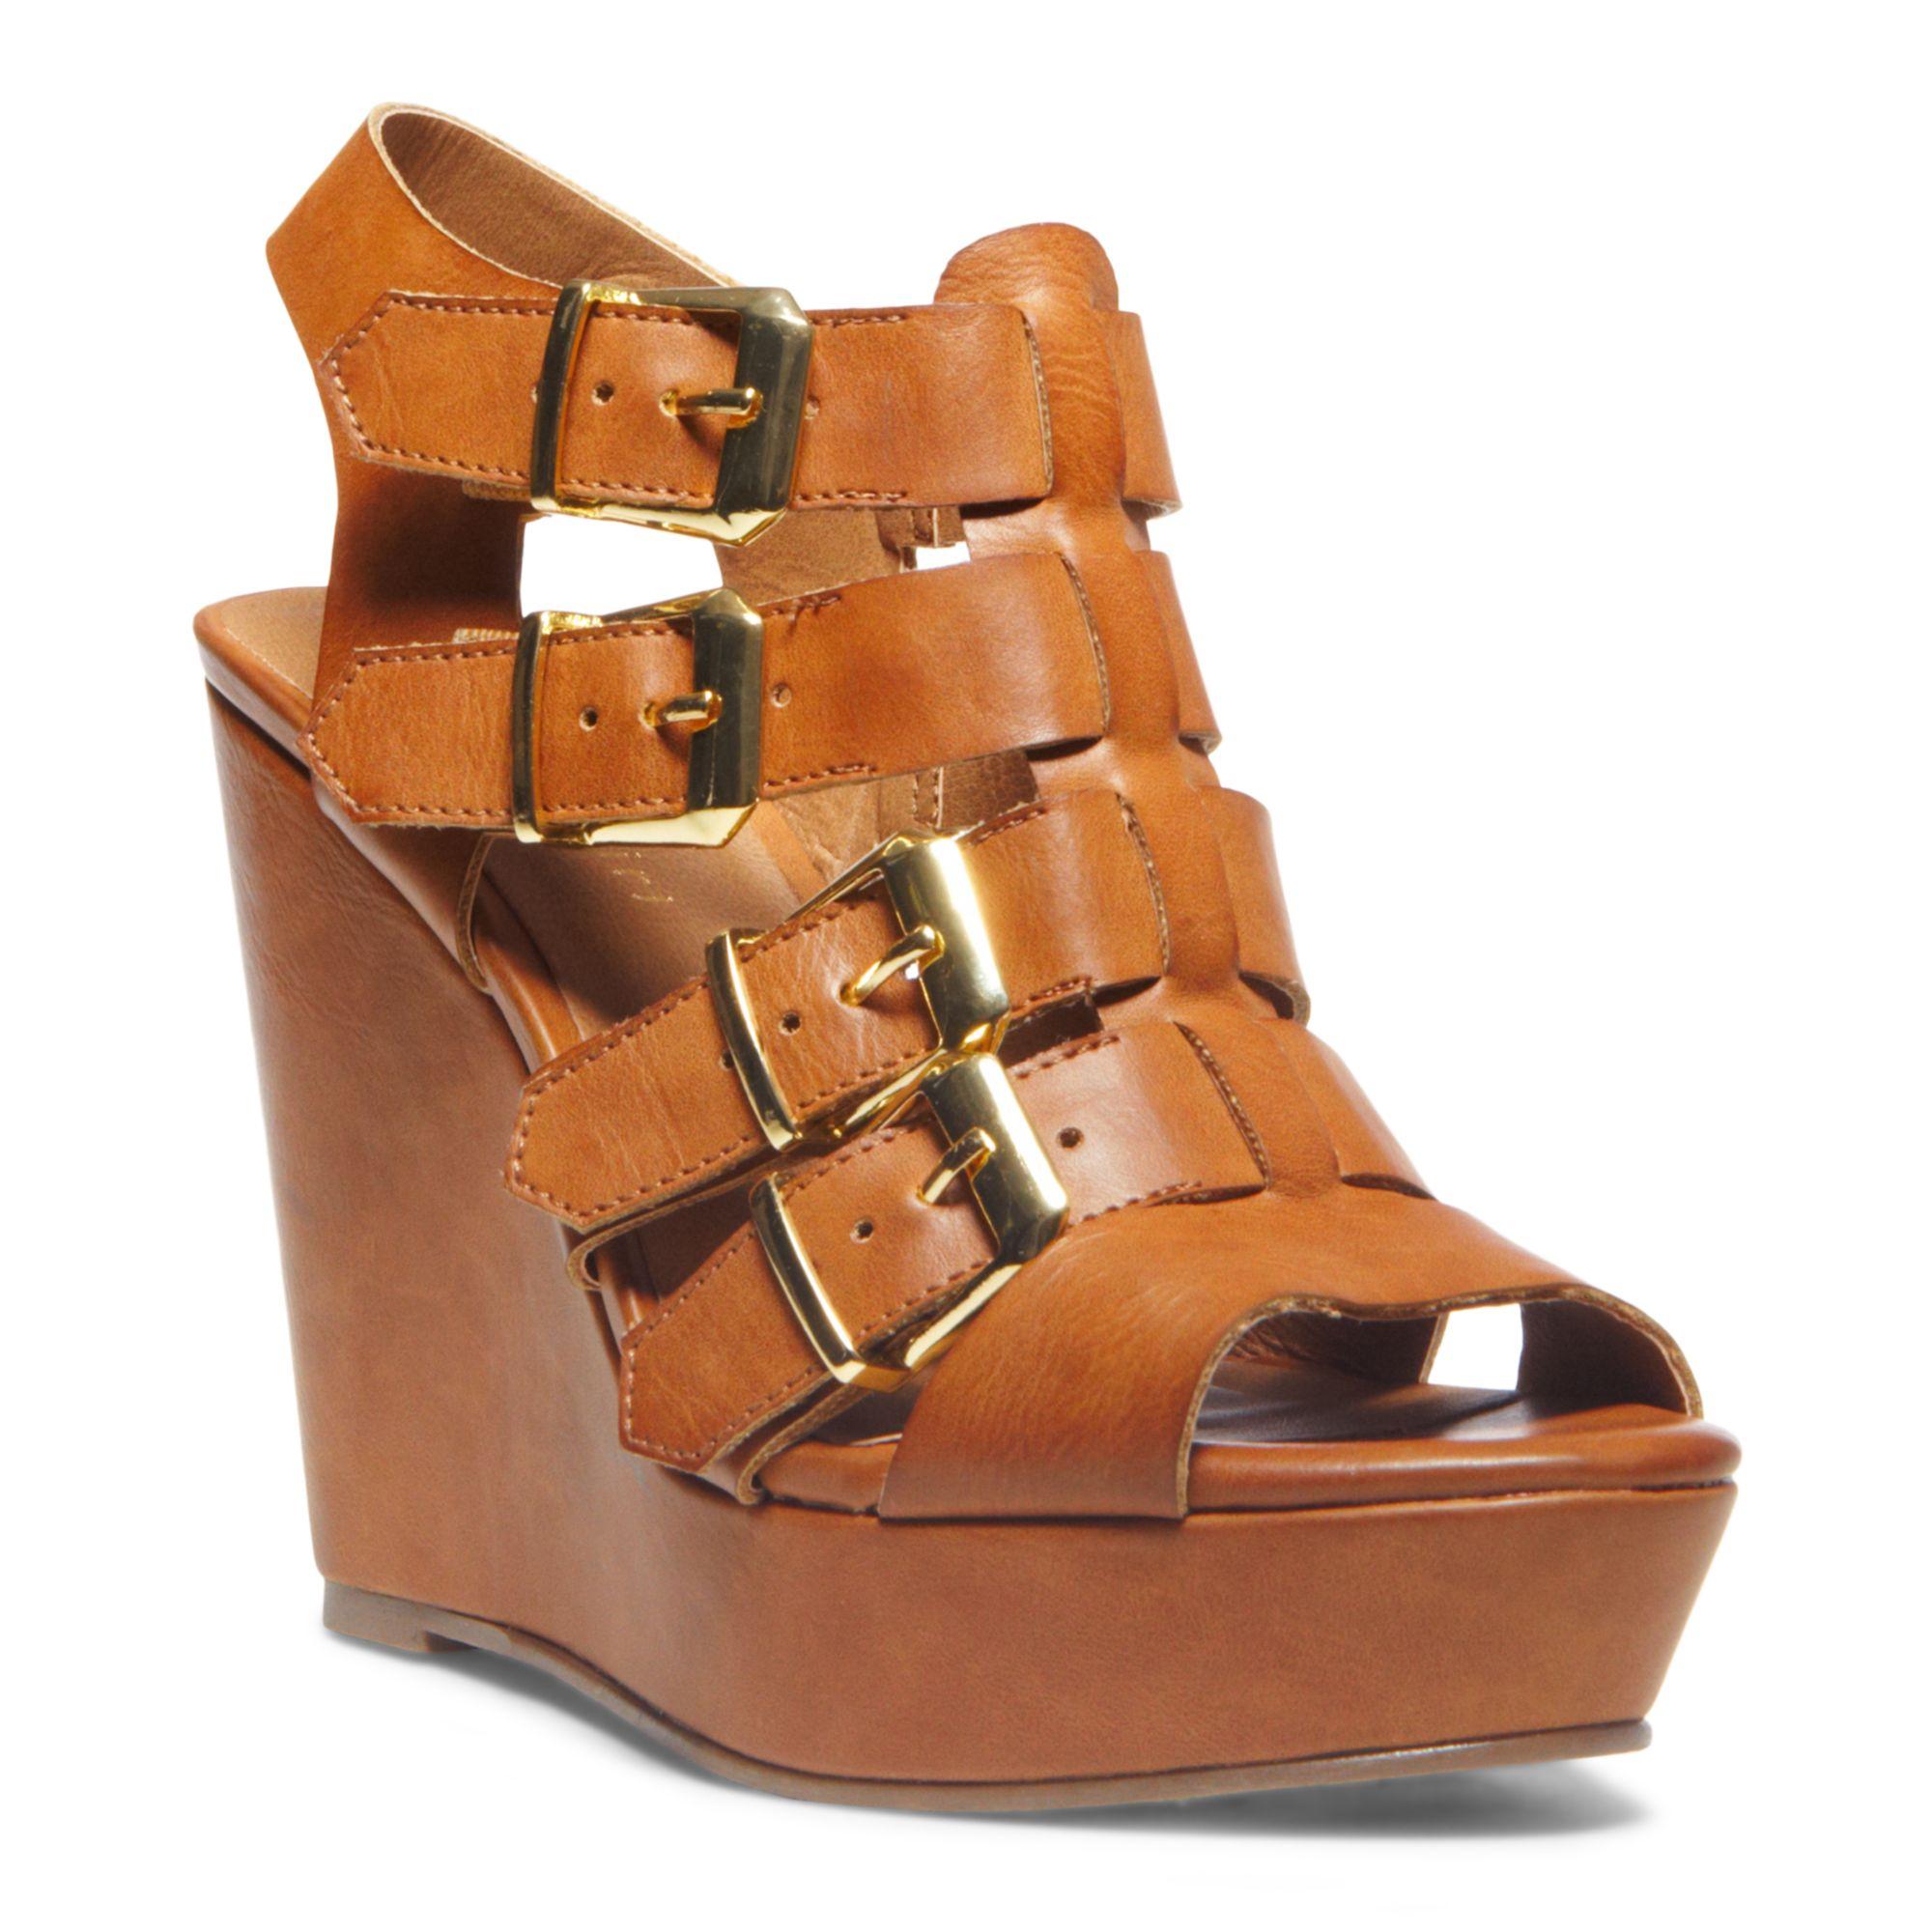 Madden girl Kloverr Platform Wedge Sandals in Brown